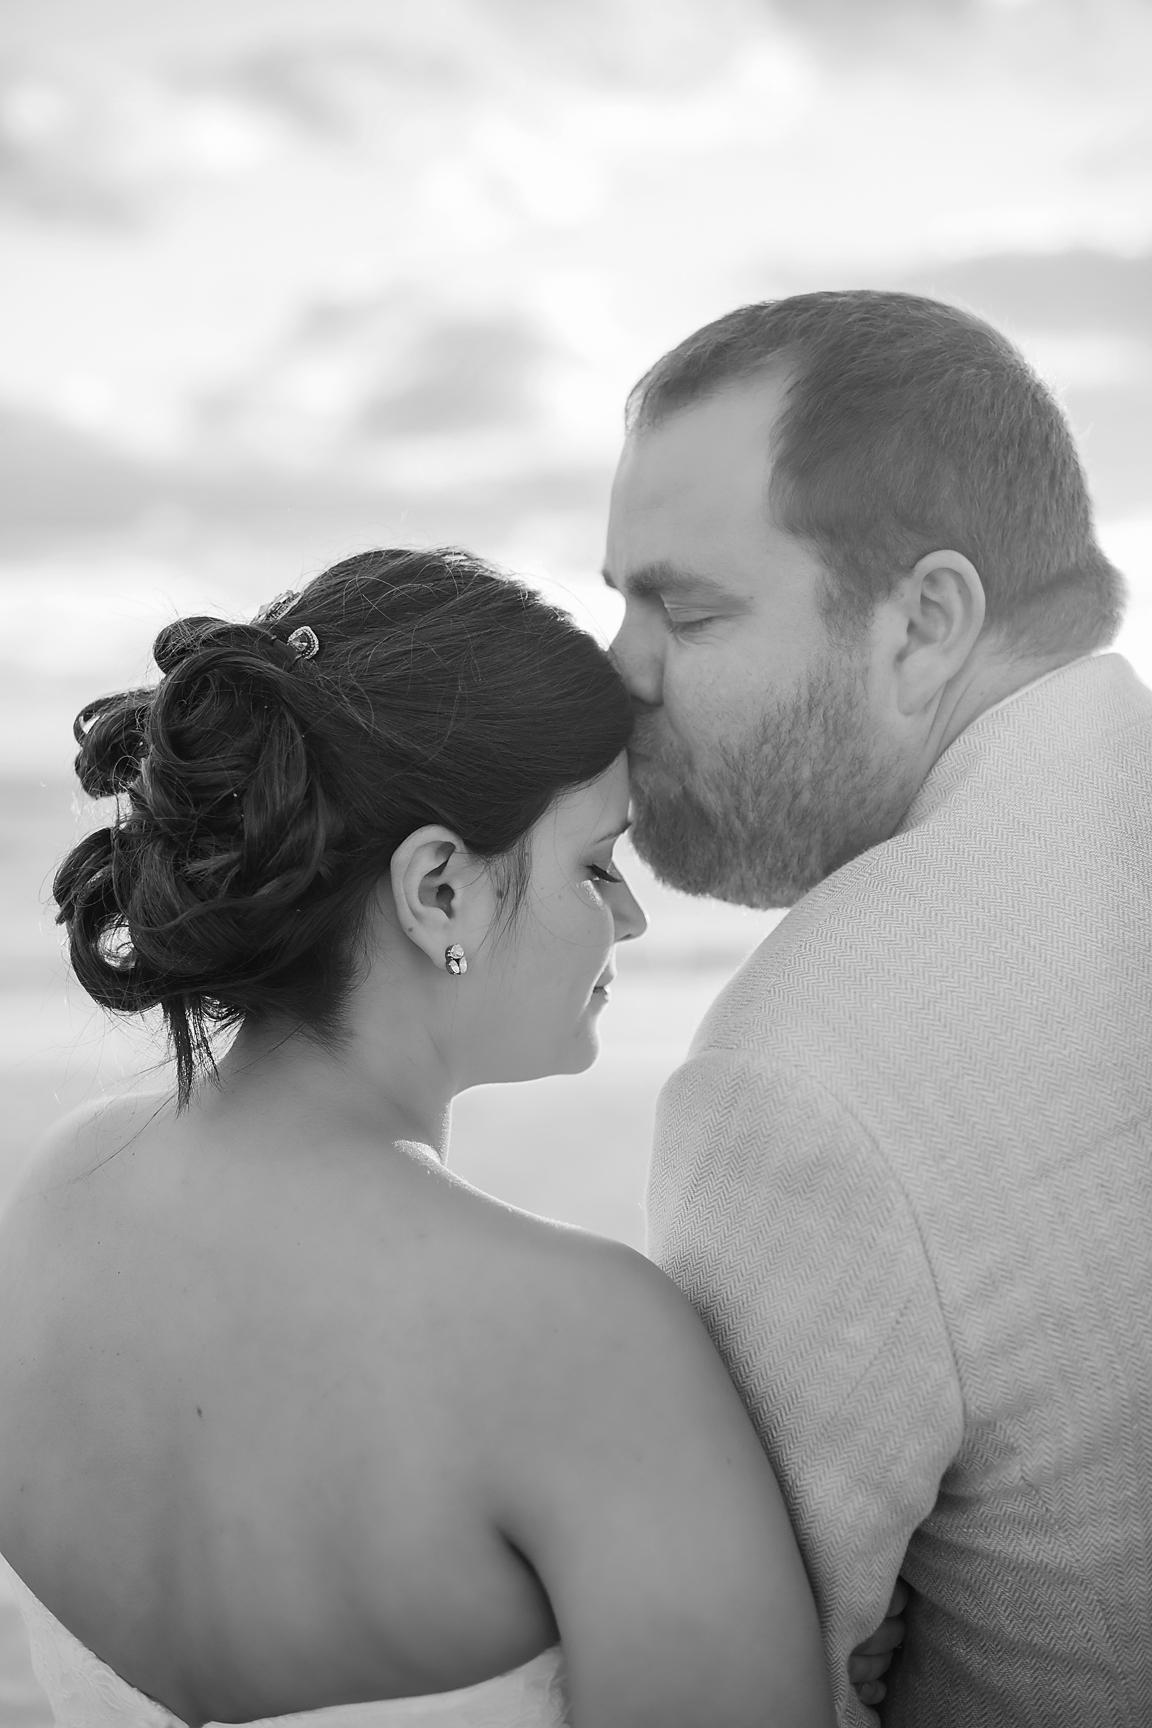 Bailey + Chalin - Anna Maria Island Wedding Photographer - Destination Wedding Photography - Emily & Co. Photography - Beach Wedding Photography 194.jpg